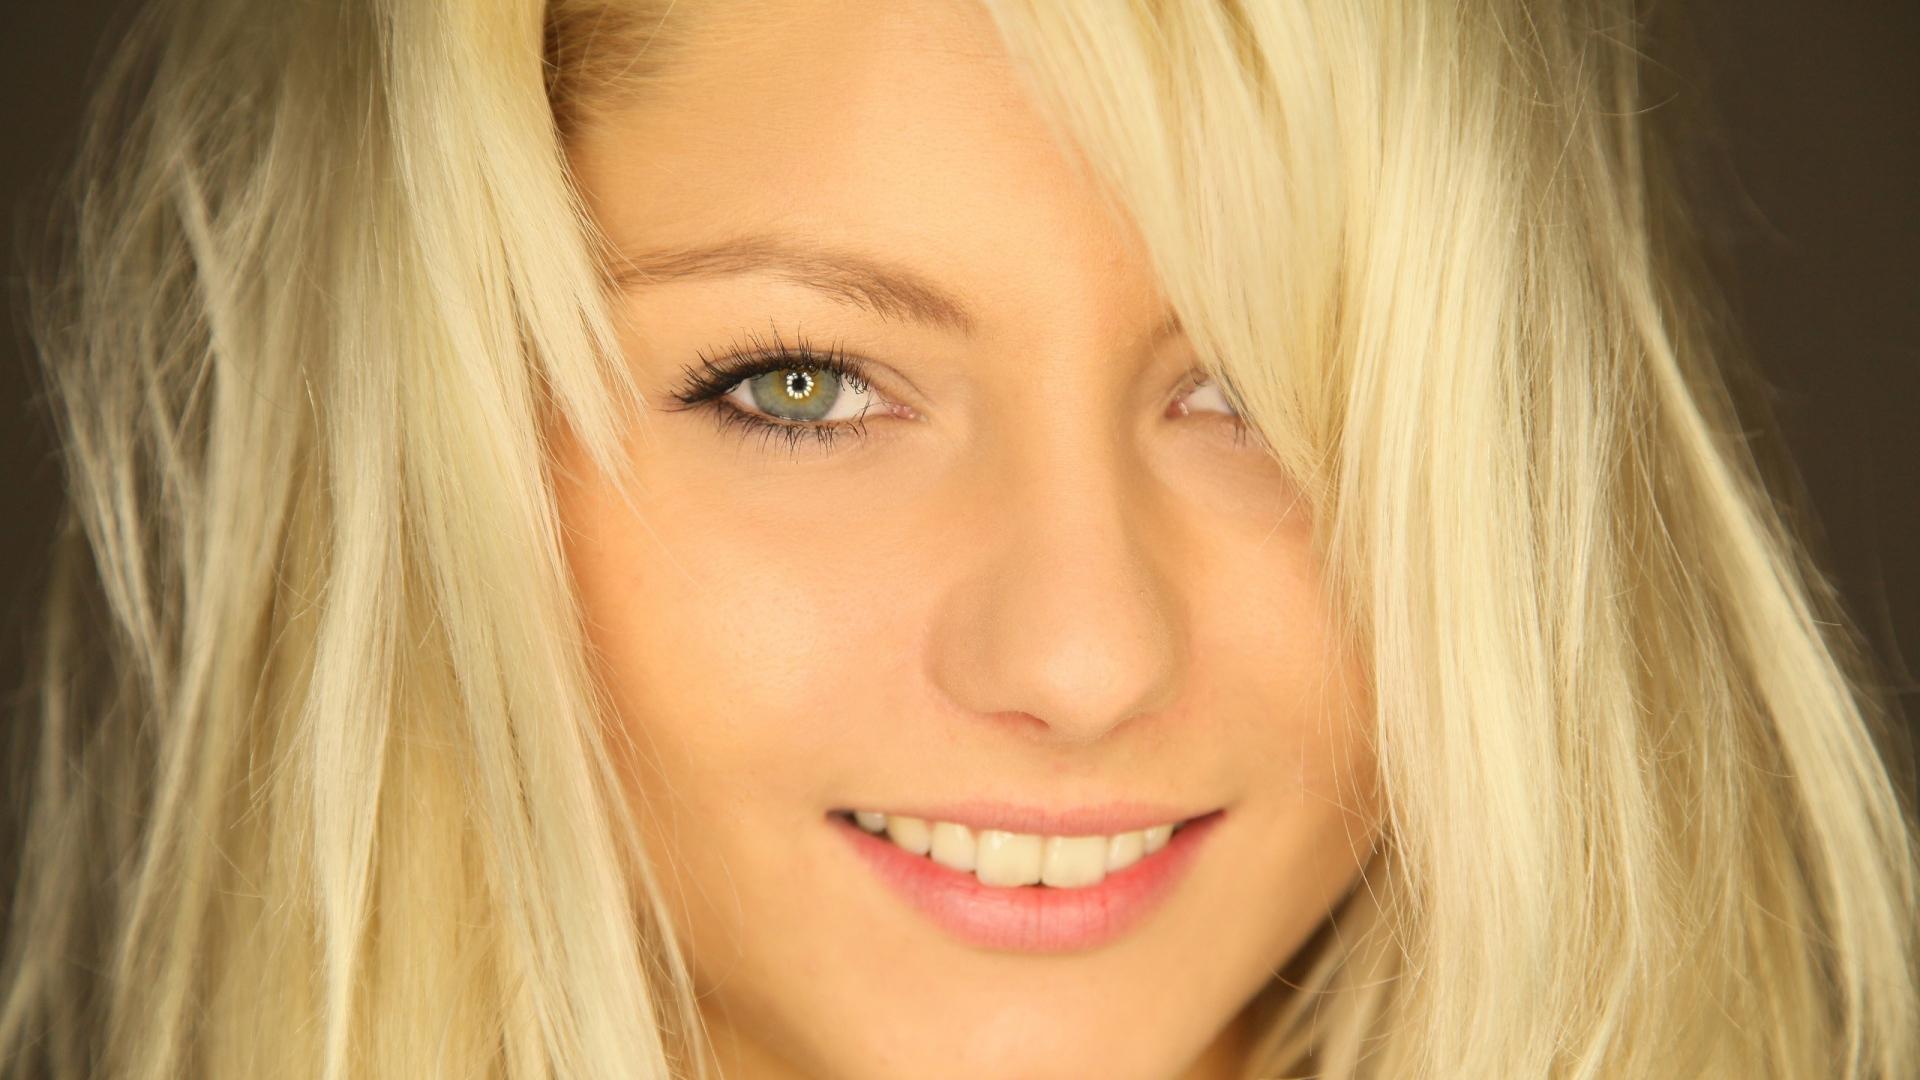 Work in progress list of blonde females in photo games